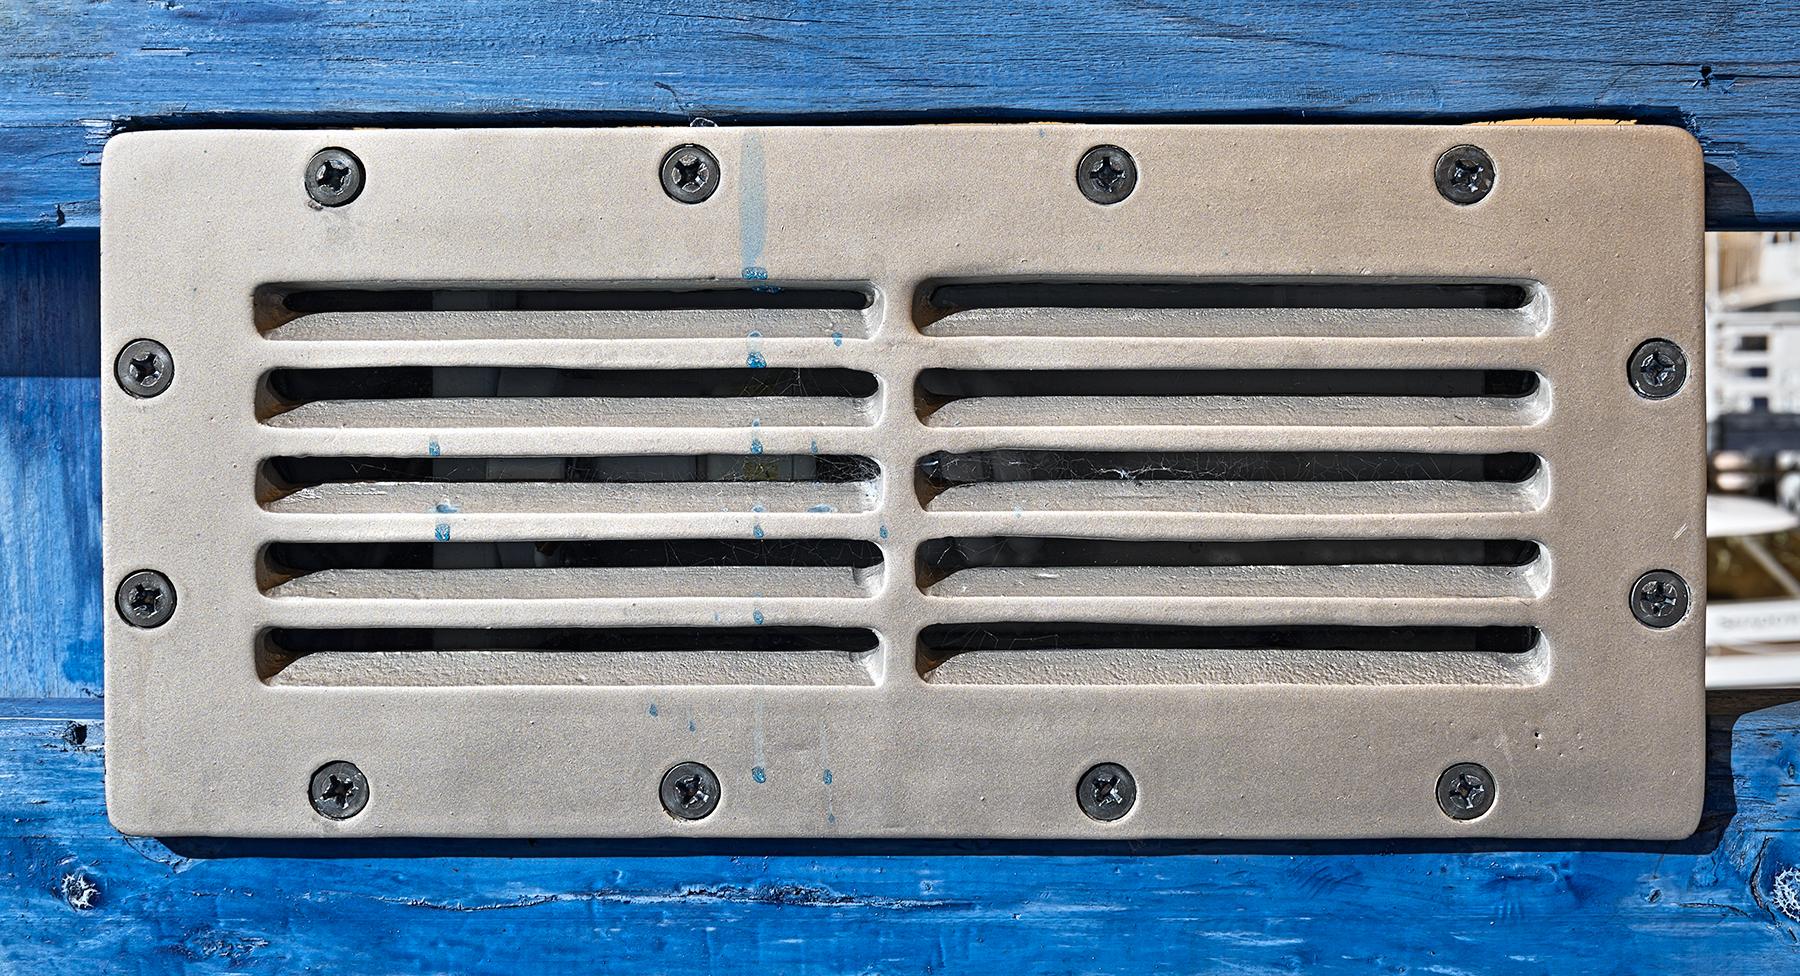 Air Vent Interface - HDR, Air, Screw, Nicolas, Object, HQ Photo